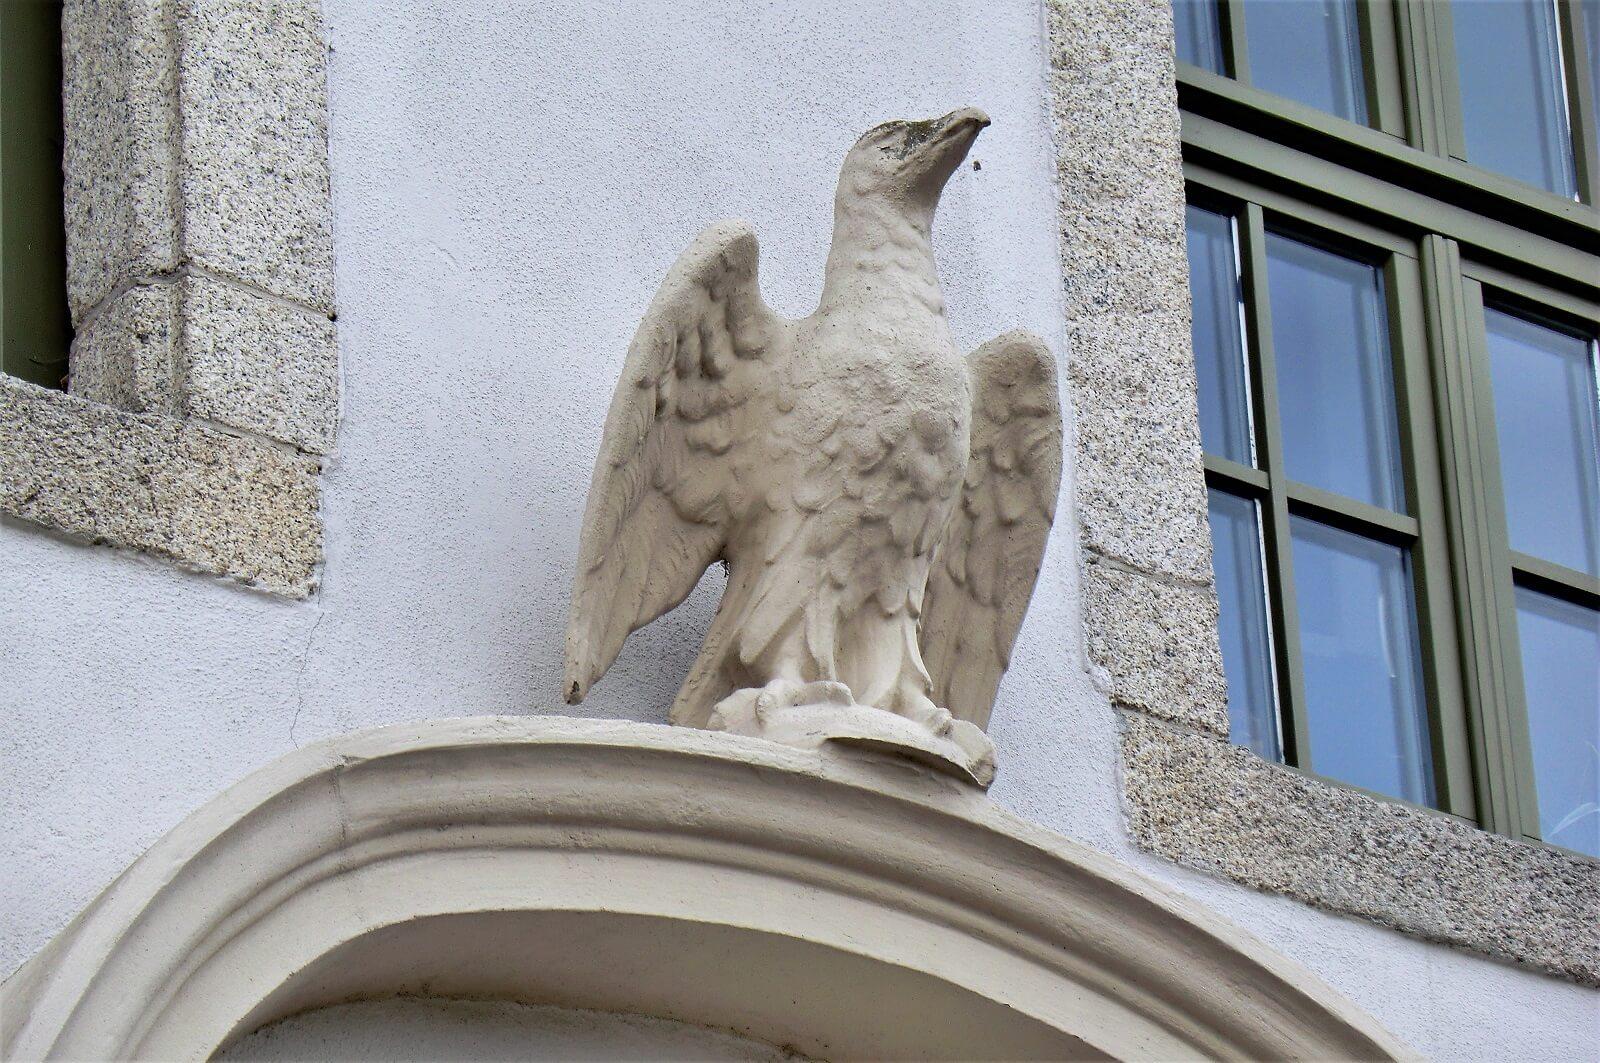 Rittergut Adlershof zu Oberlauterbach - Adlerstatue © Jens Reiher